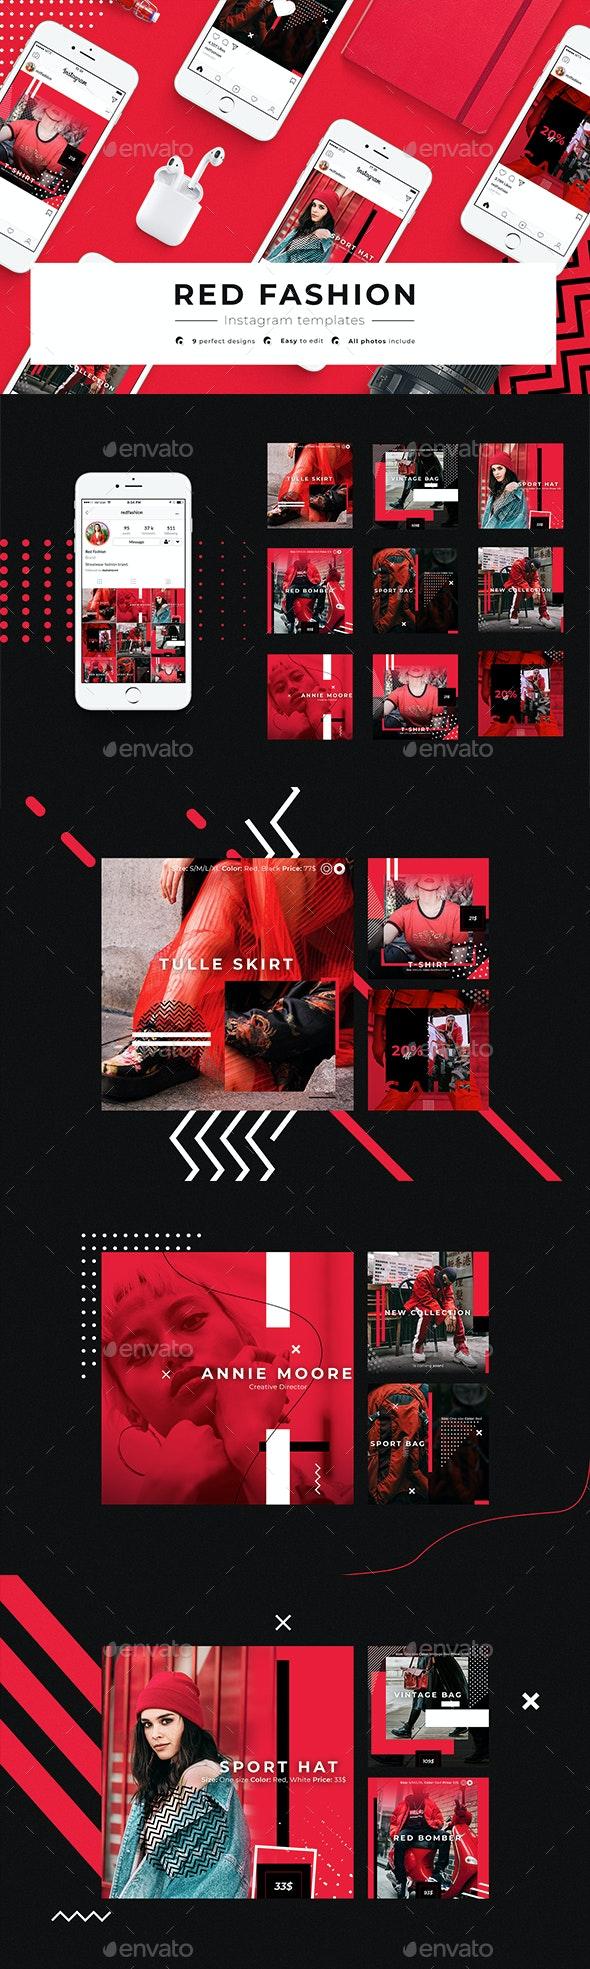 Red Fashion — Instagram Templates - Social Media Web Elements